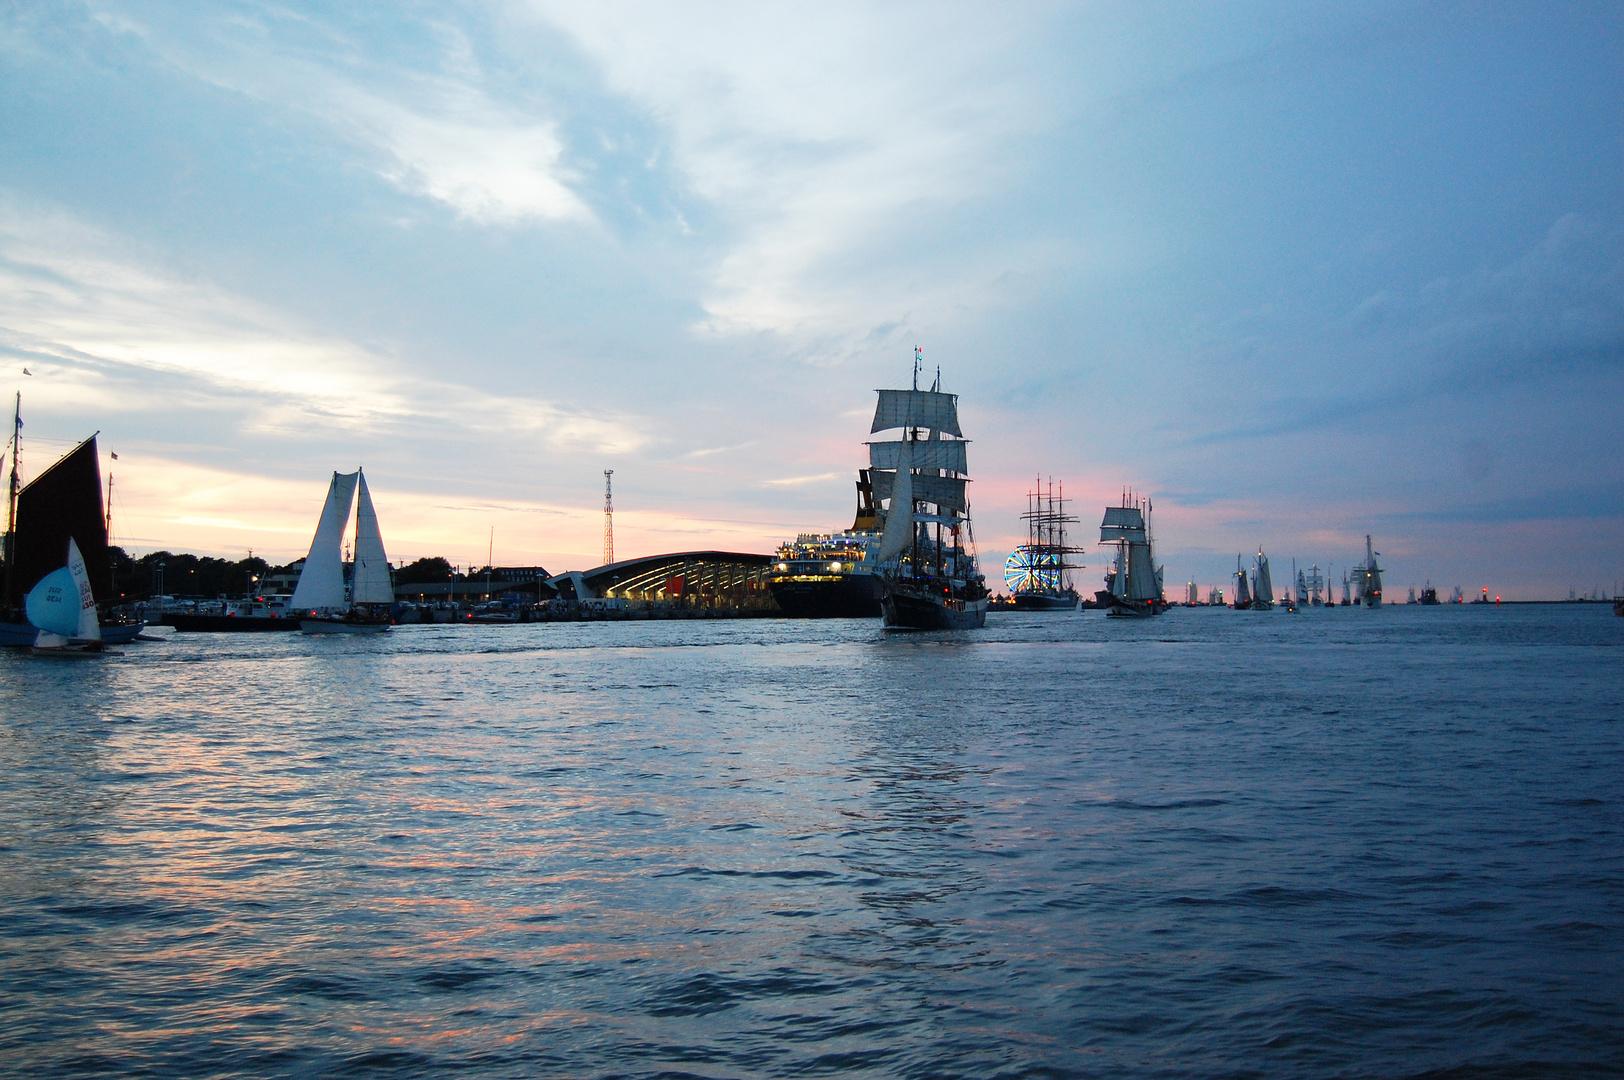 20. Rostocker Hanse Sail 4